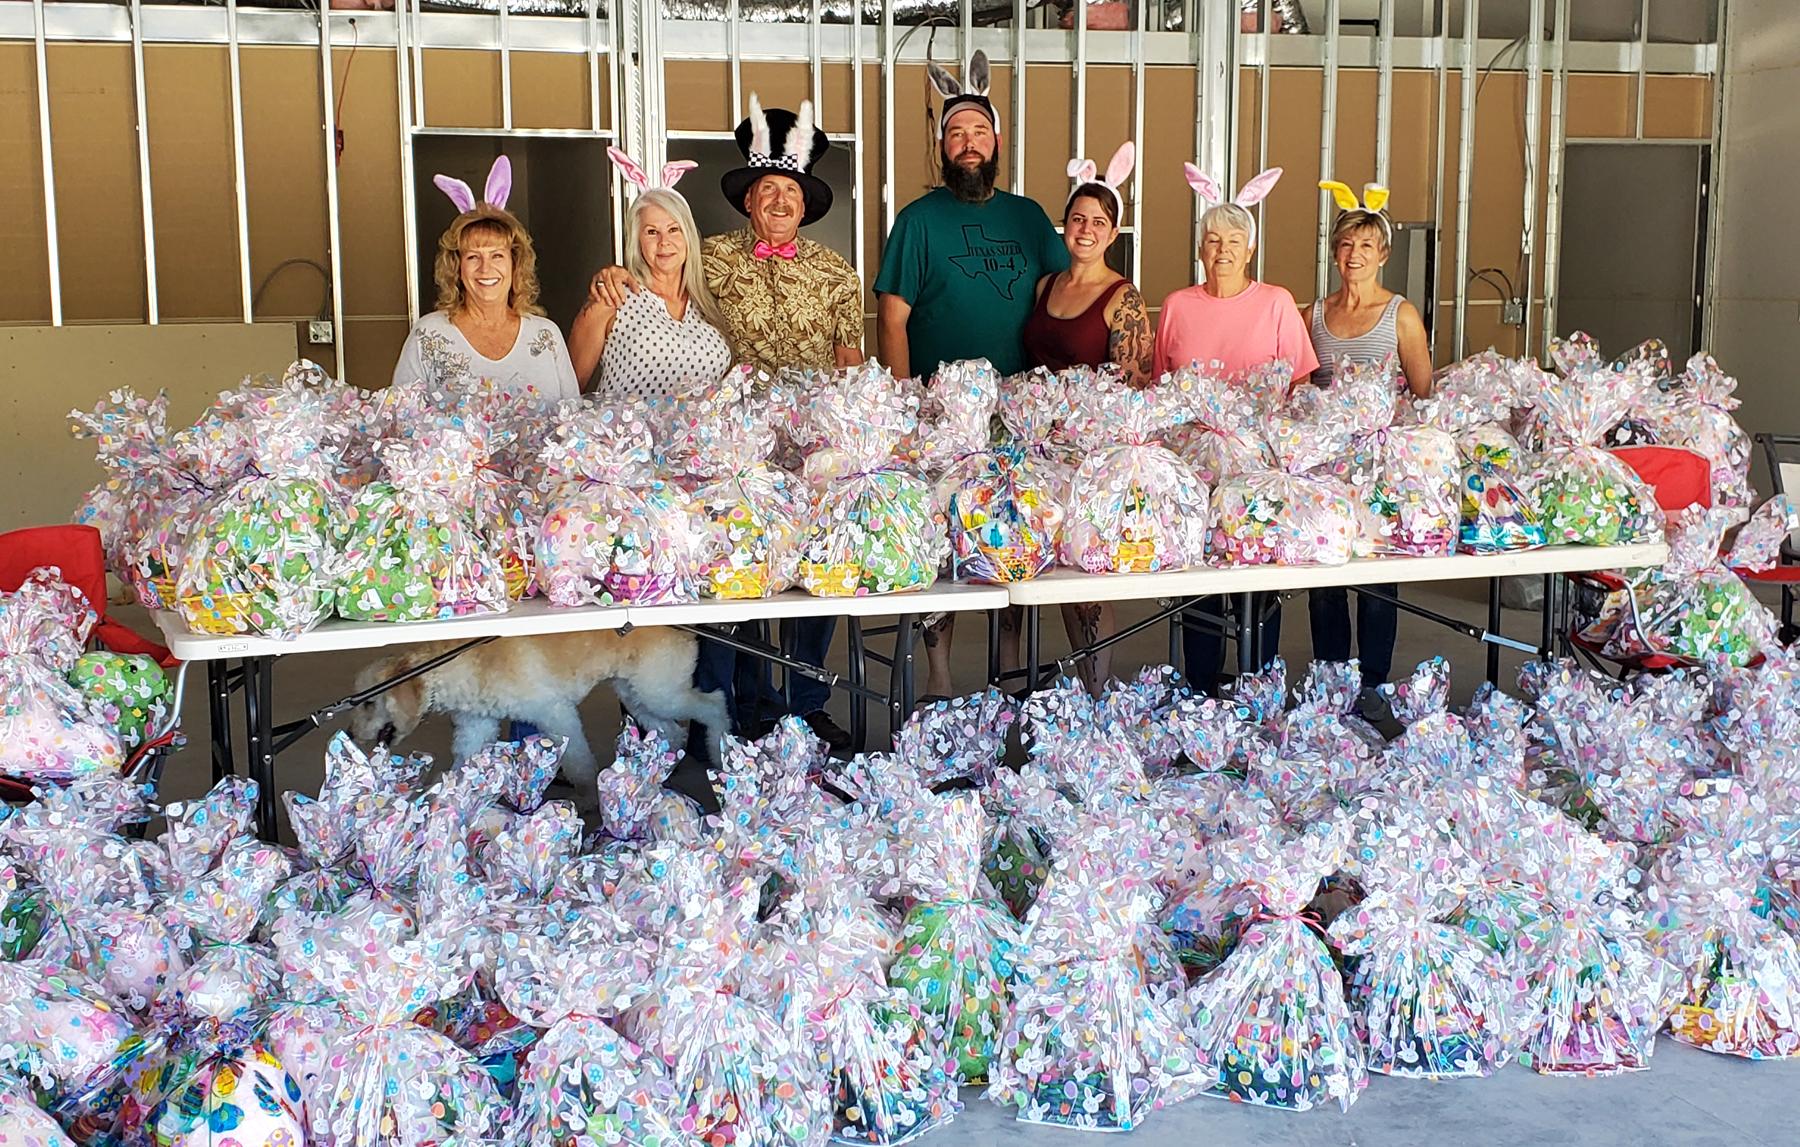 Kiwanis Easter Bunnies Make Holiday Joyful For H.A.V.E.N. Families